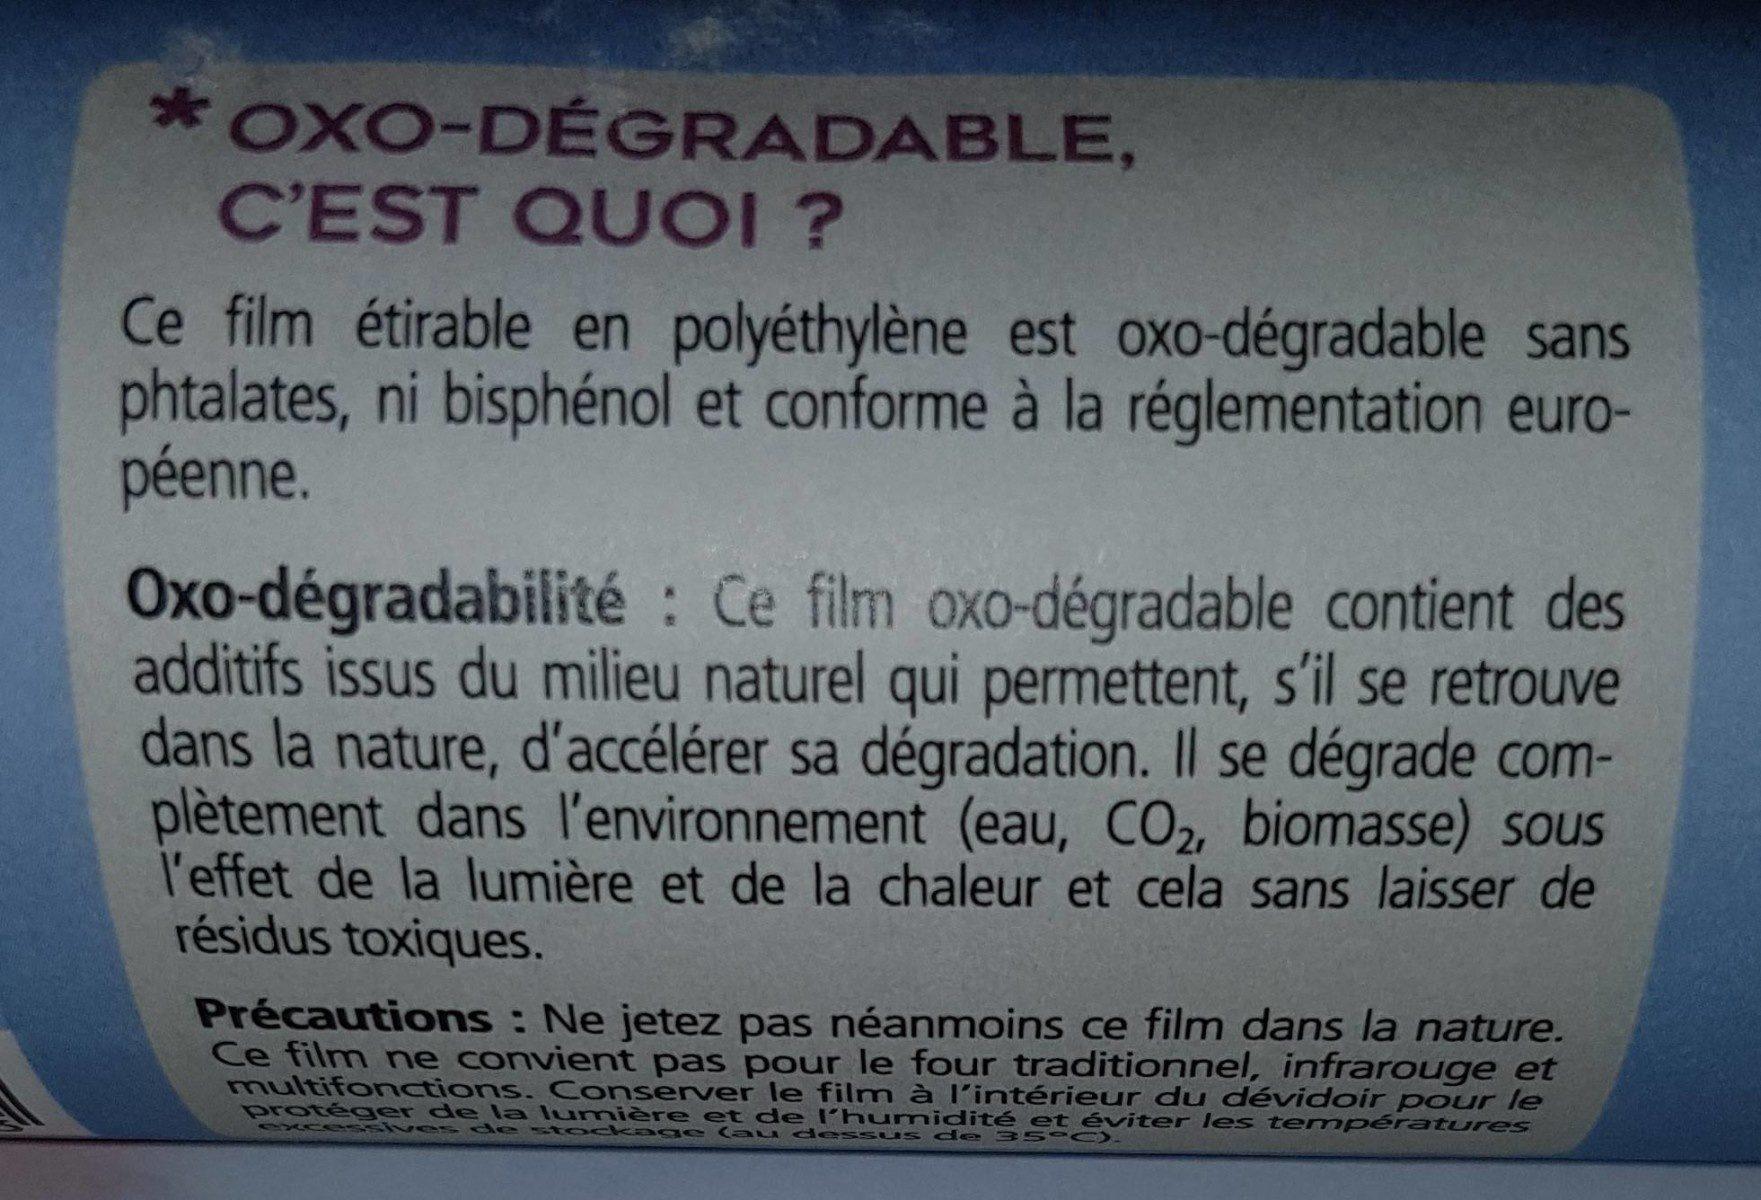 Recharge filme étirable oxo-dégradable - Ingredients - fr